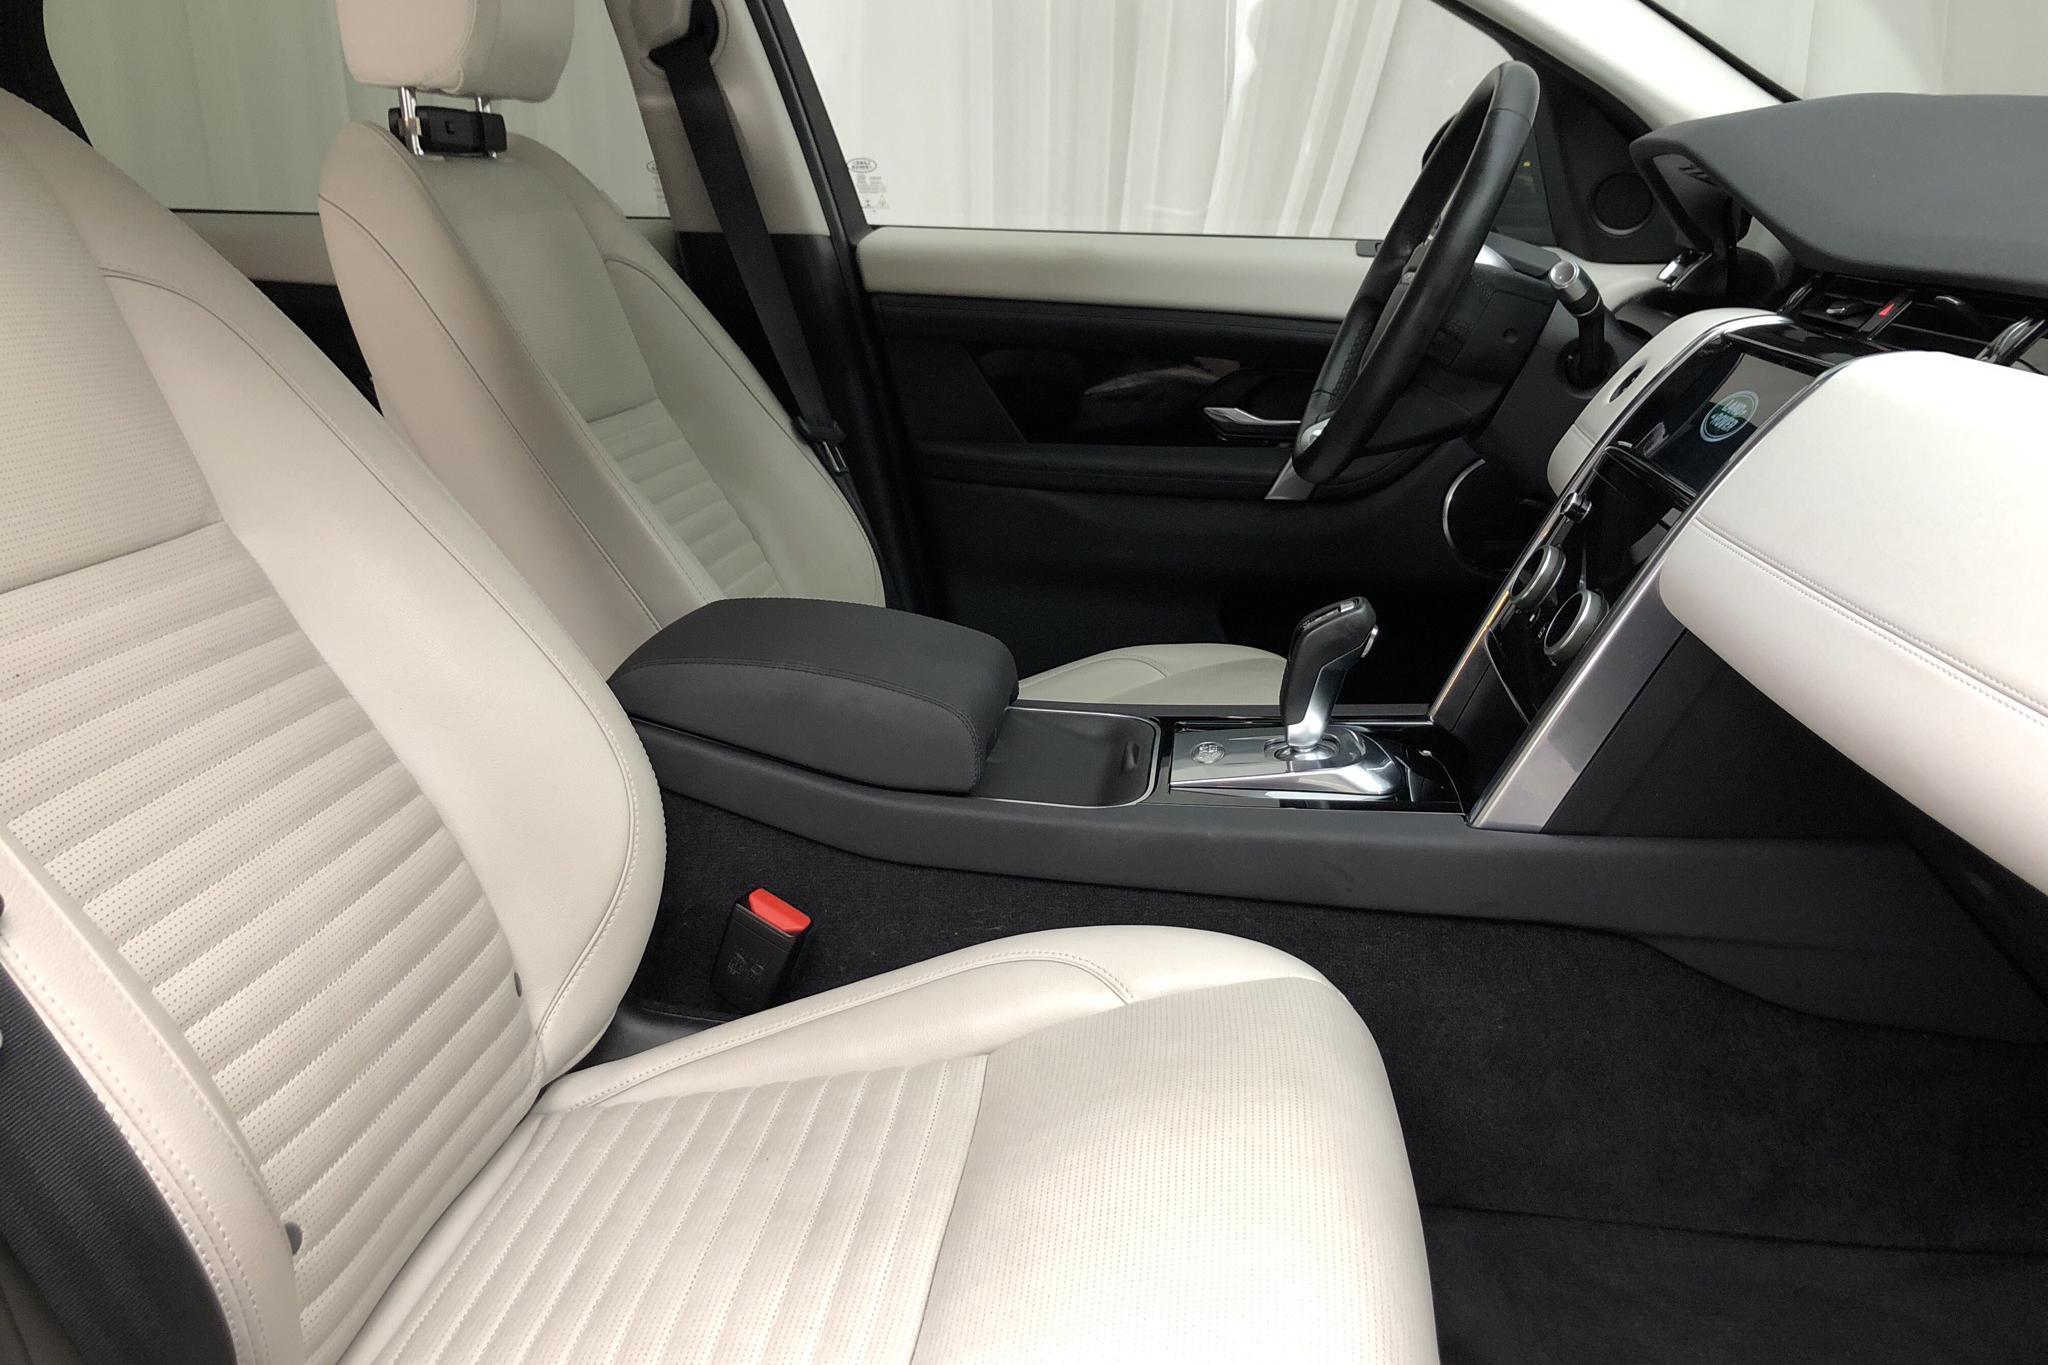 Land Rover Discovery Sport D180 AWD (180hk) - 4 792 mil - Automat - grå - 2020